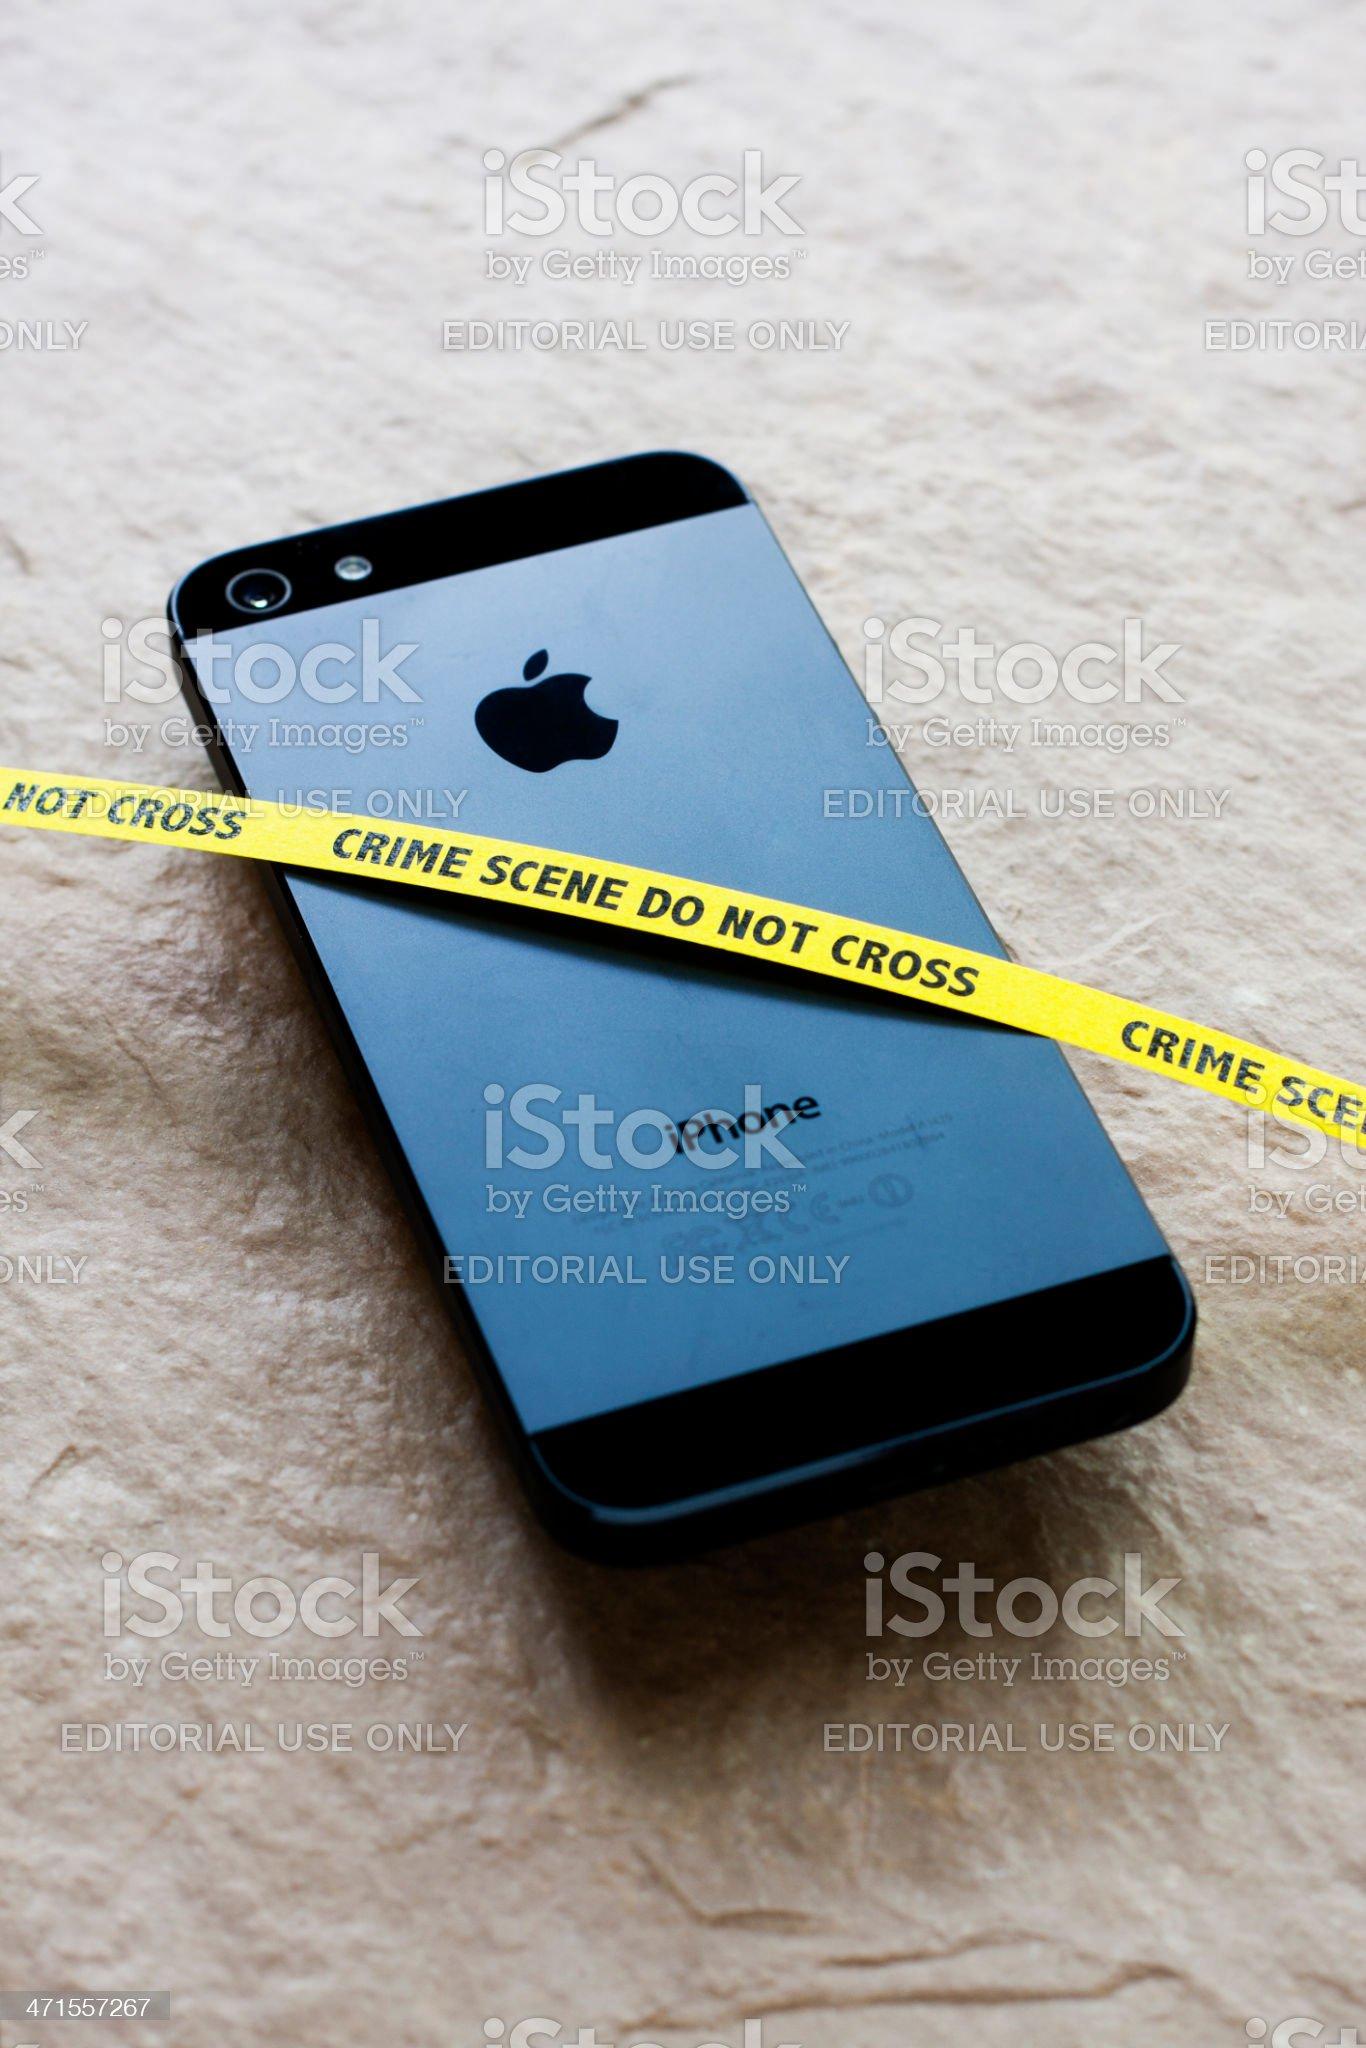 Apple iPhone Crime Scene royalty-free stock photo